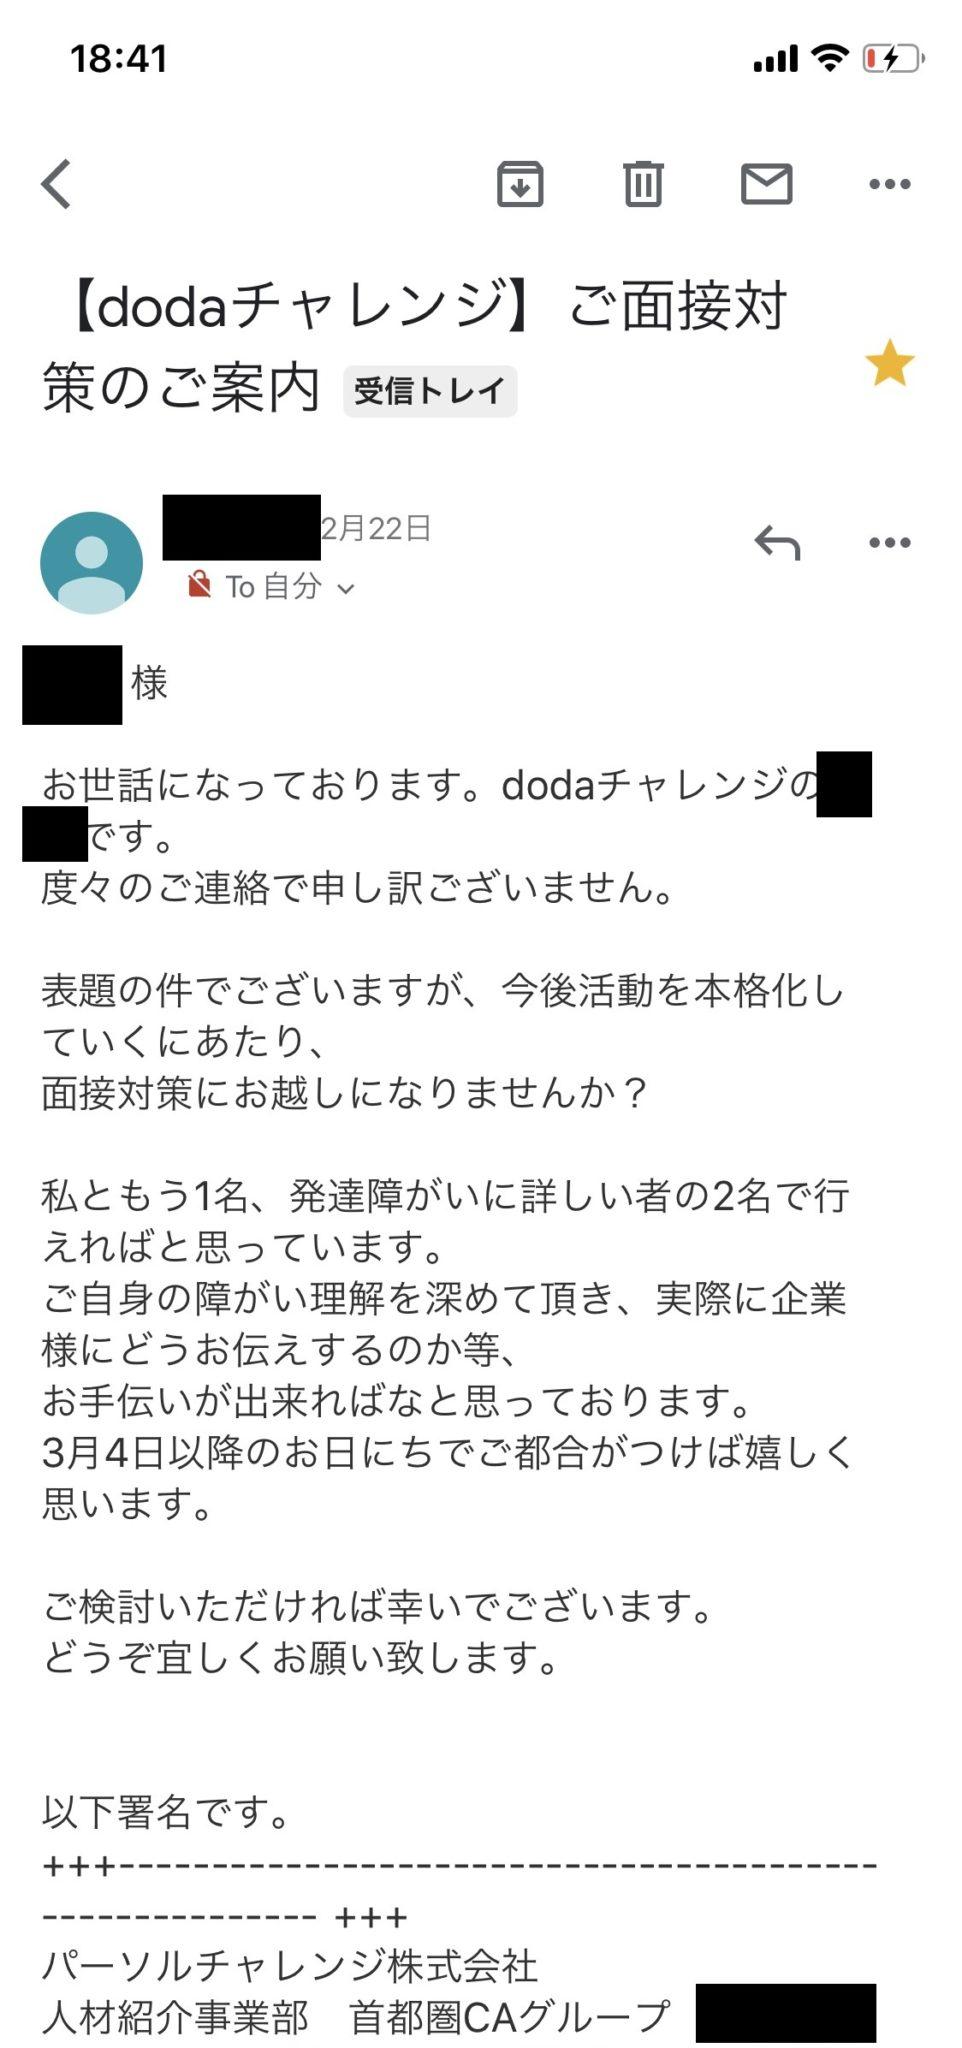 dodaチャレンジ_面接対策のご案内文面